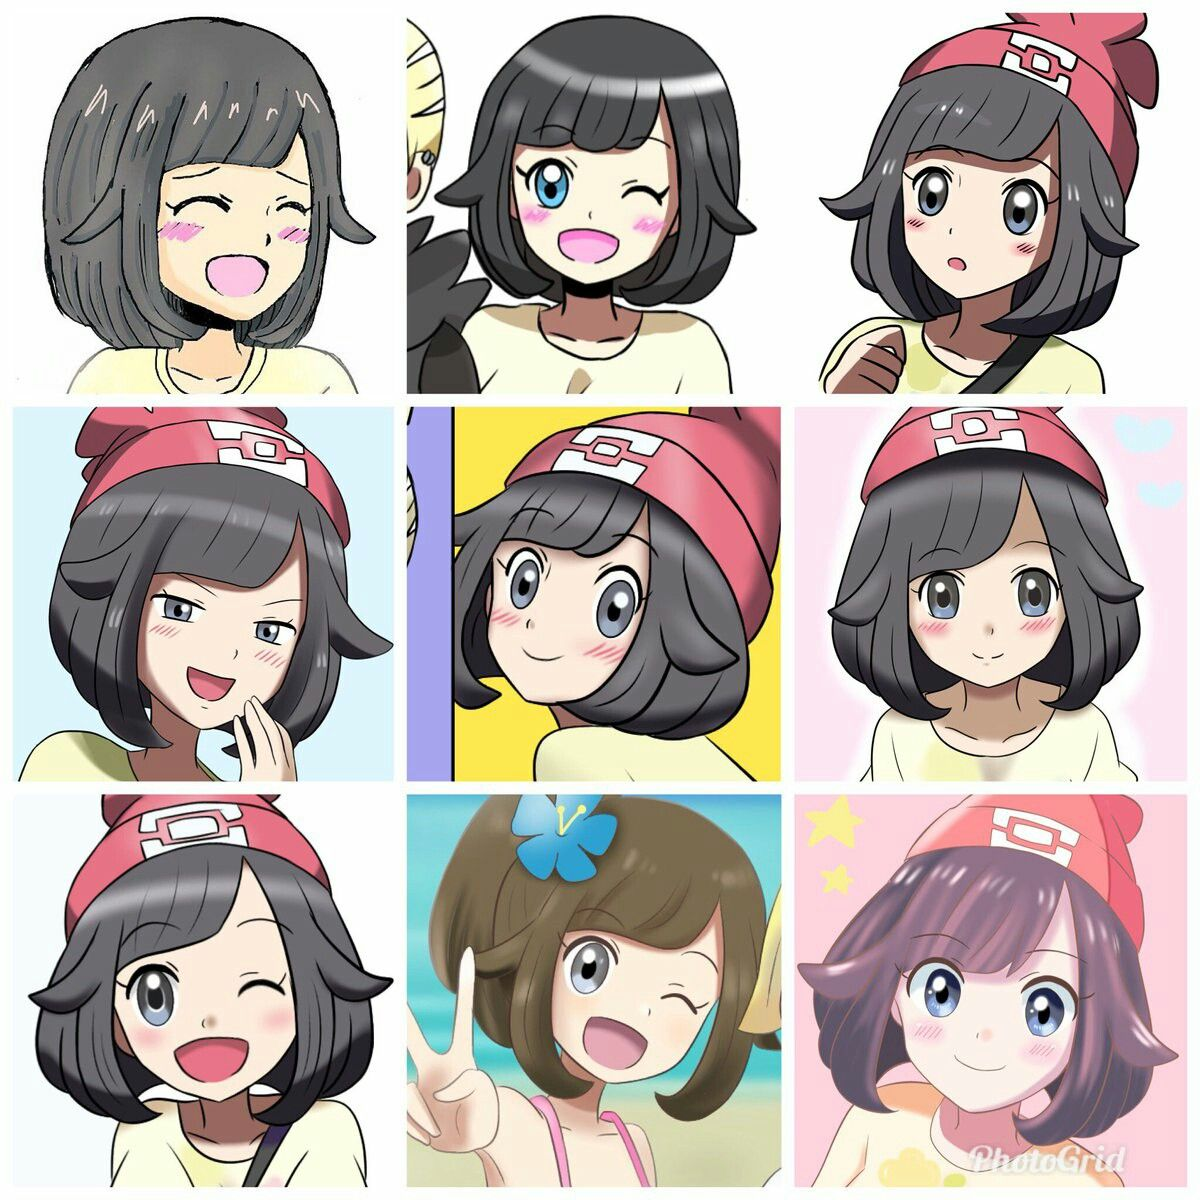 Pin By Alyson Moon On Po Que Mao Pokemon Characters Pokemon Anime